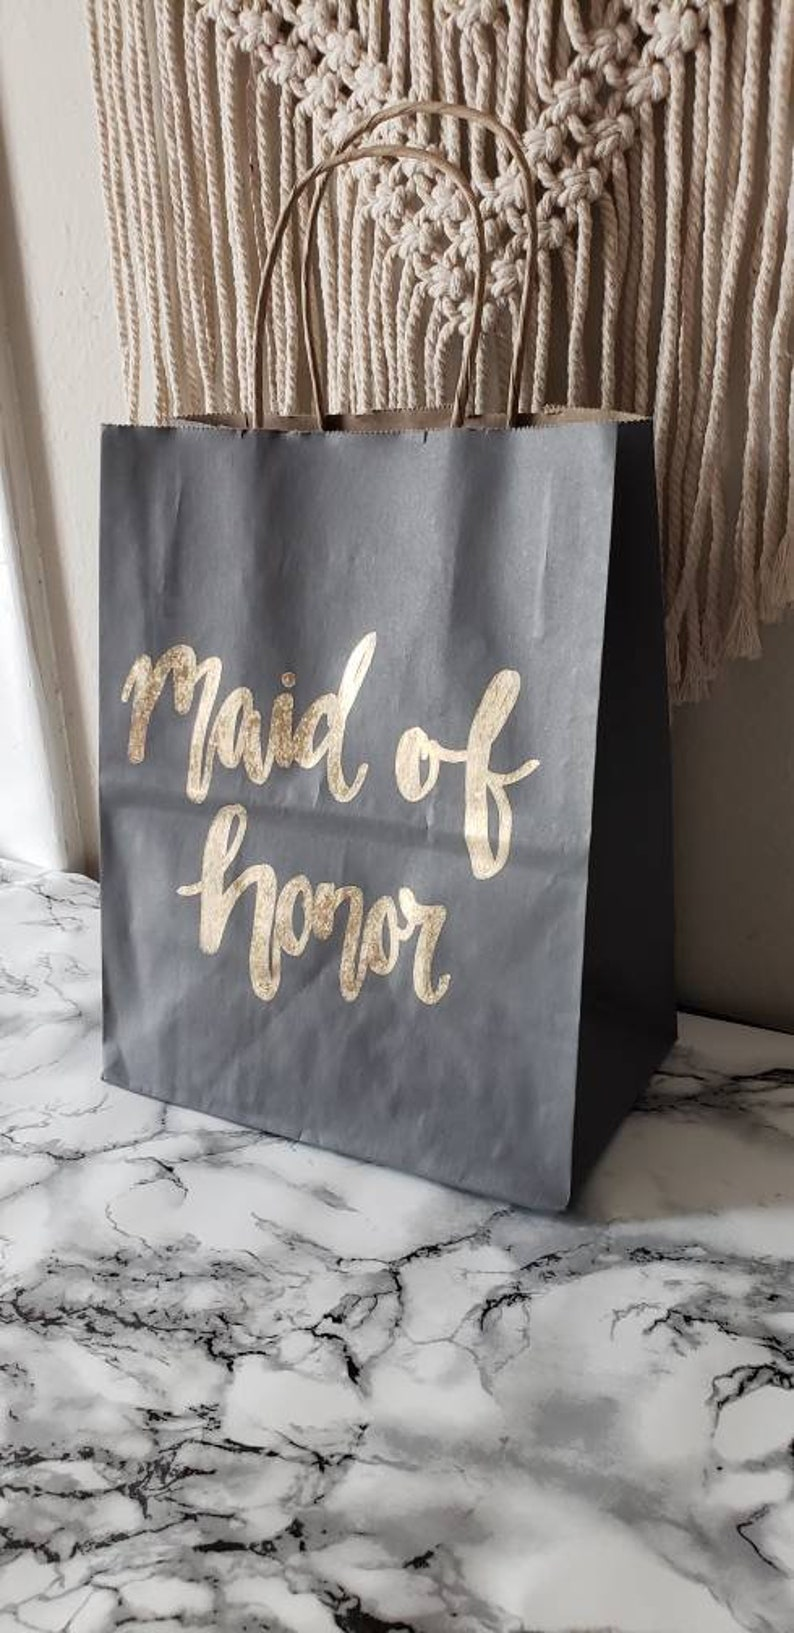 Medium Gift Bag Custom Gift Bags Calligraphy Gift Bag Bridesmaid Gift Bag Handlettered Gift Bag Grey Gift Bag Wedding Party Gift